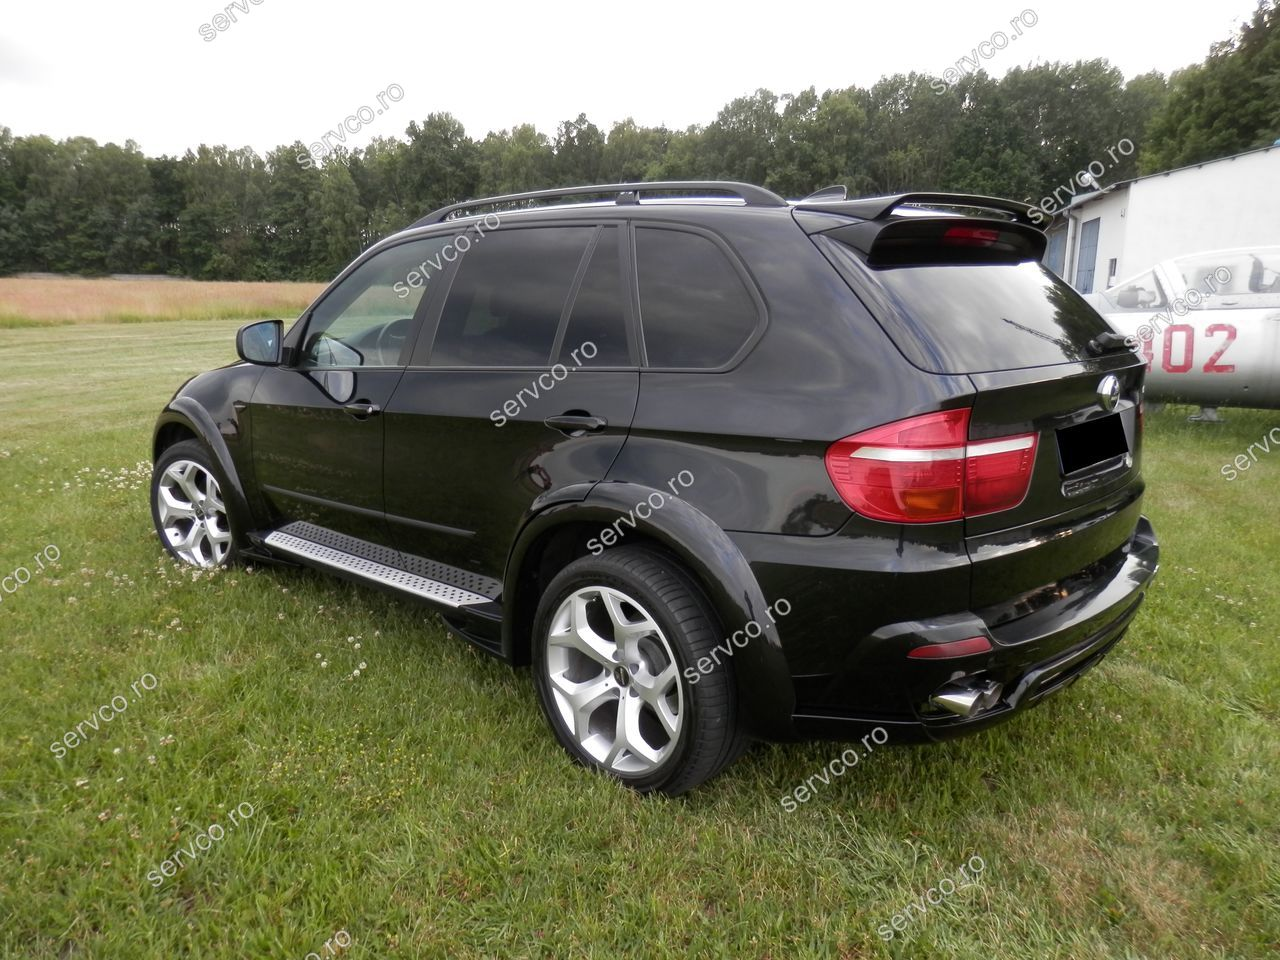 Eleron tuning sport BMW X5 E70 Lci Aero pachet M tech ...